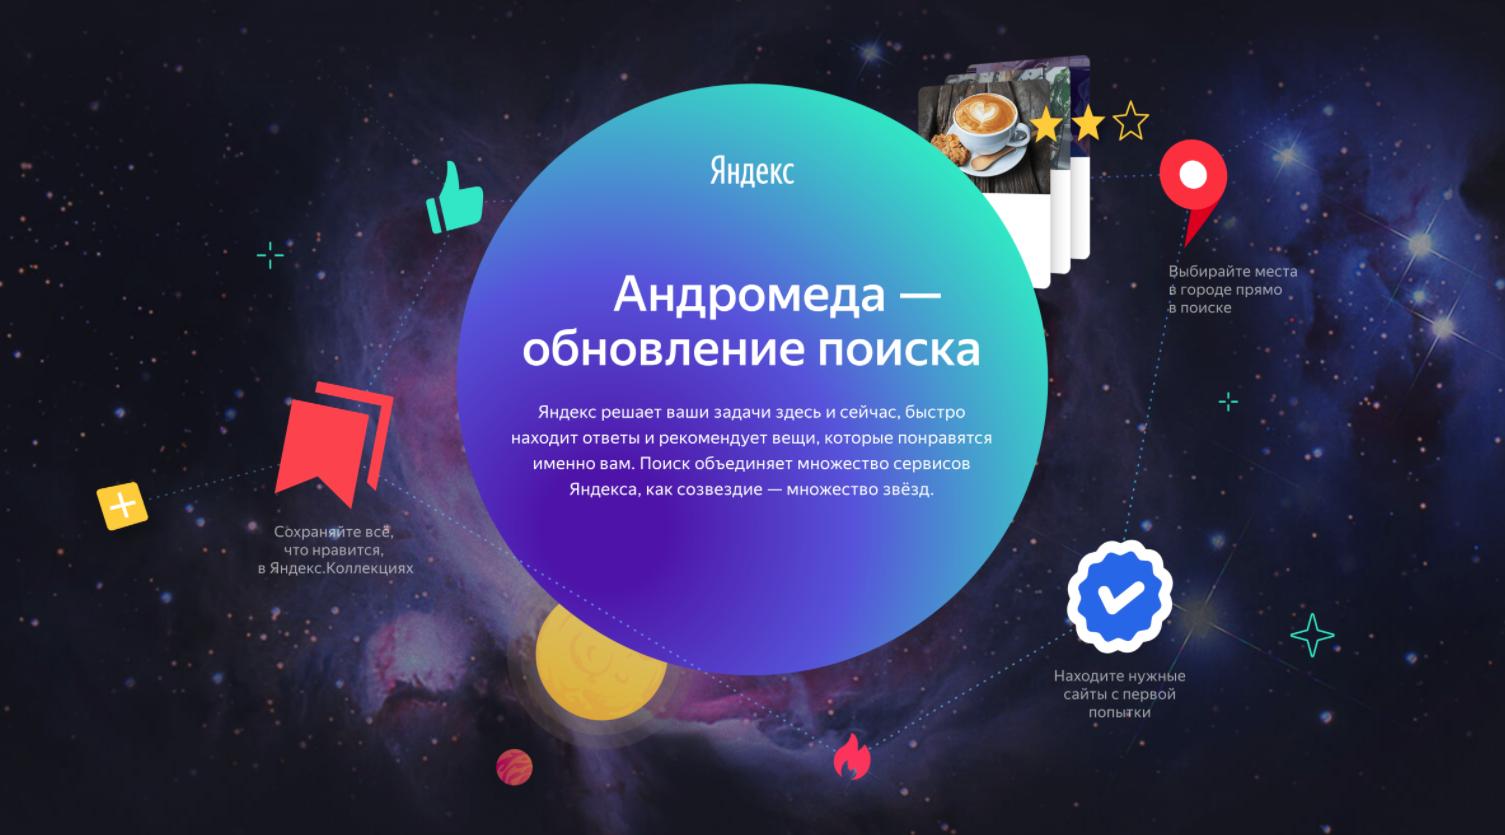 Яндекс представил обновлённый поиск «Андромеда»